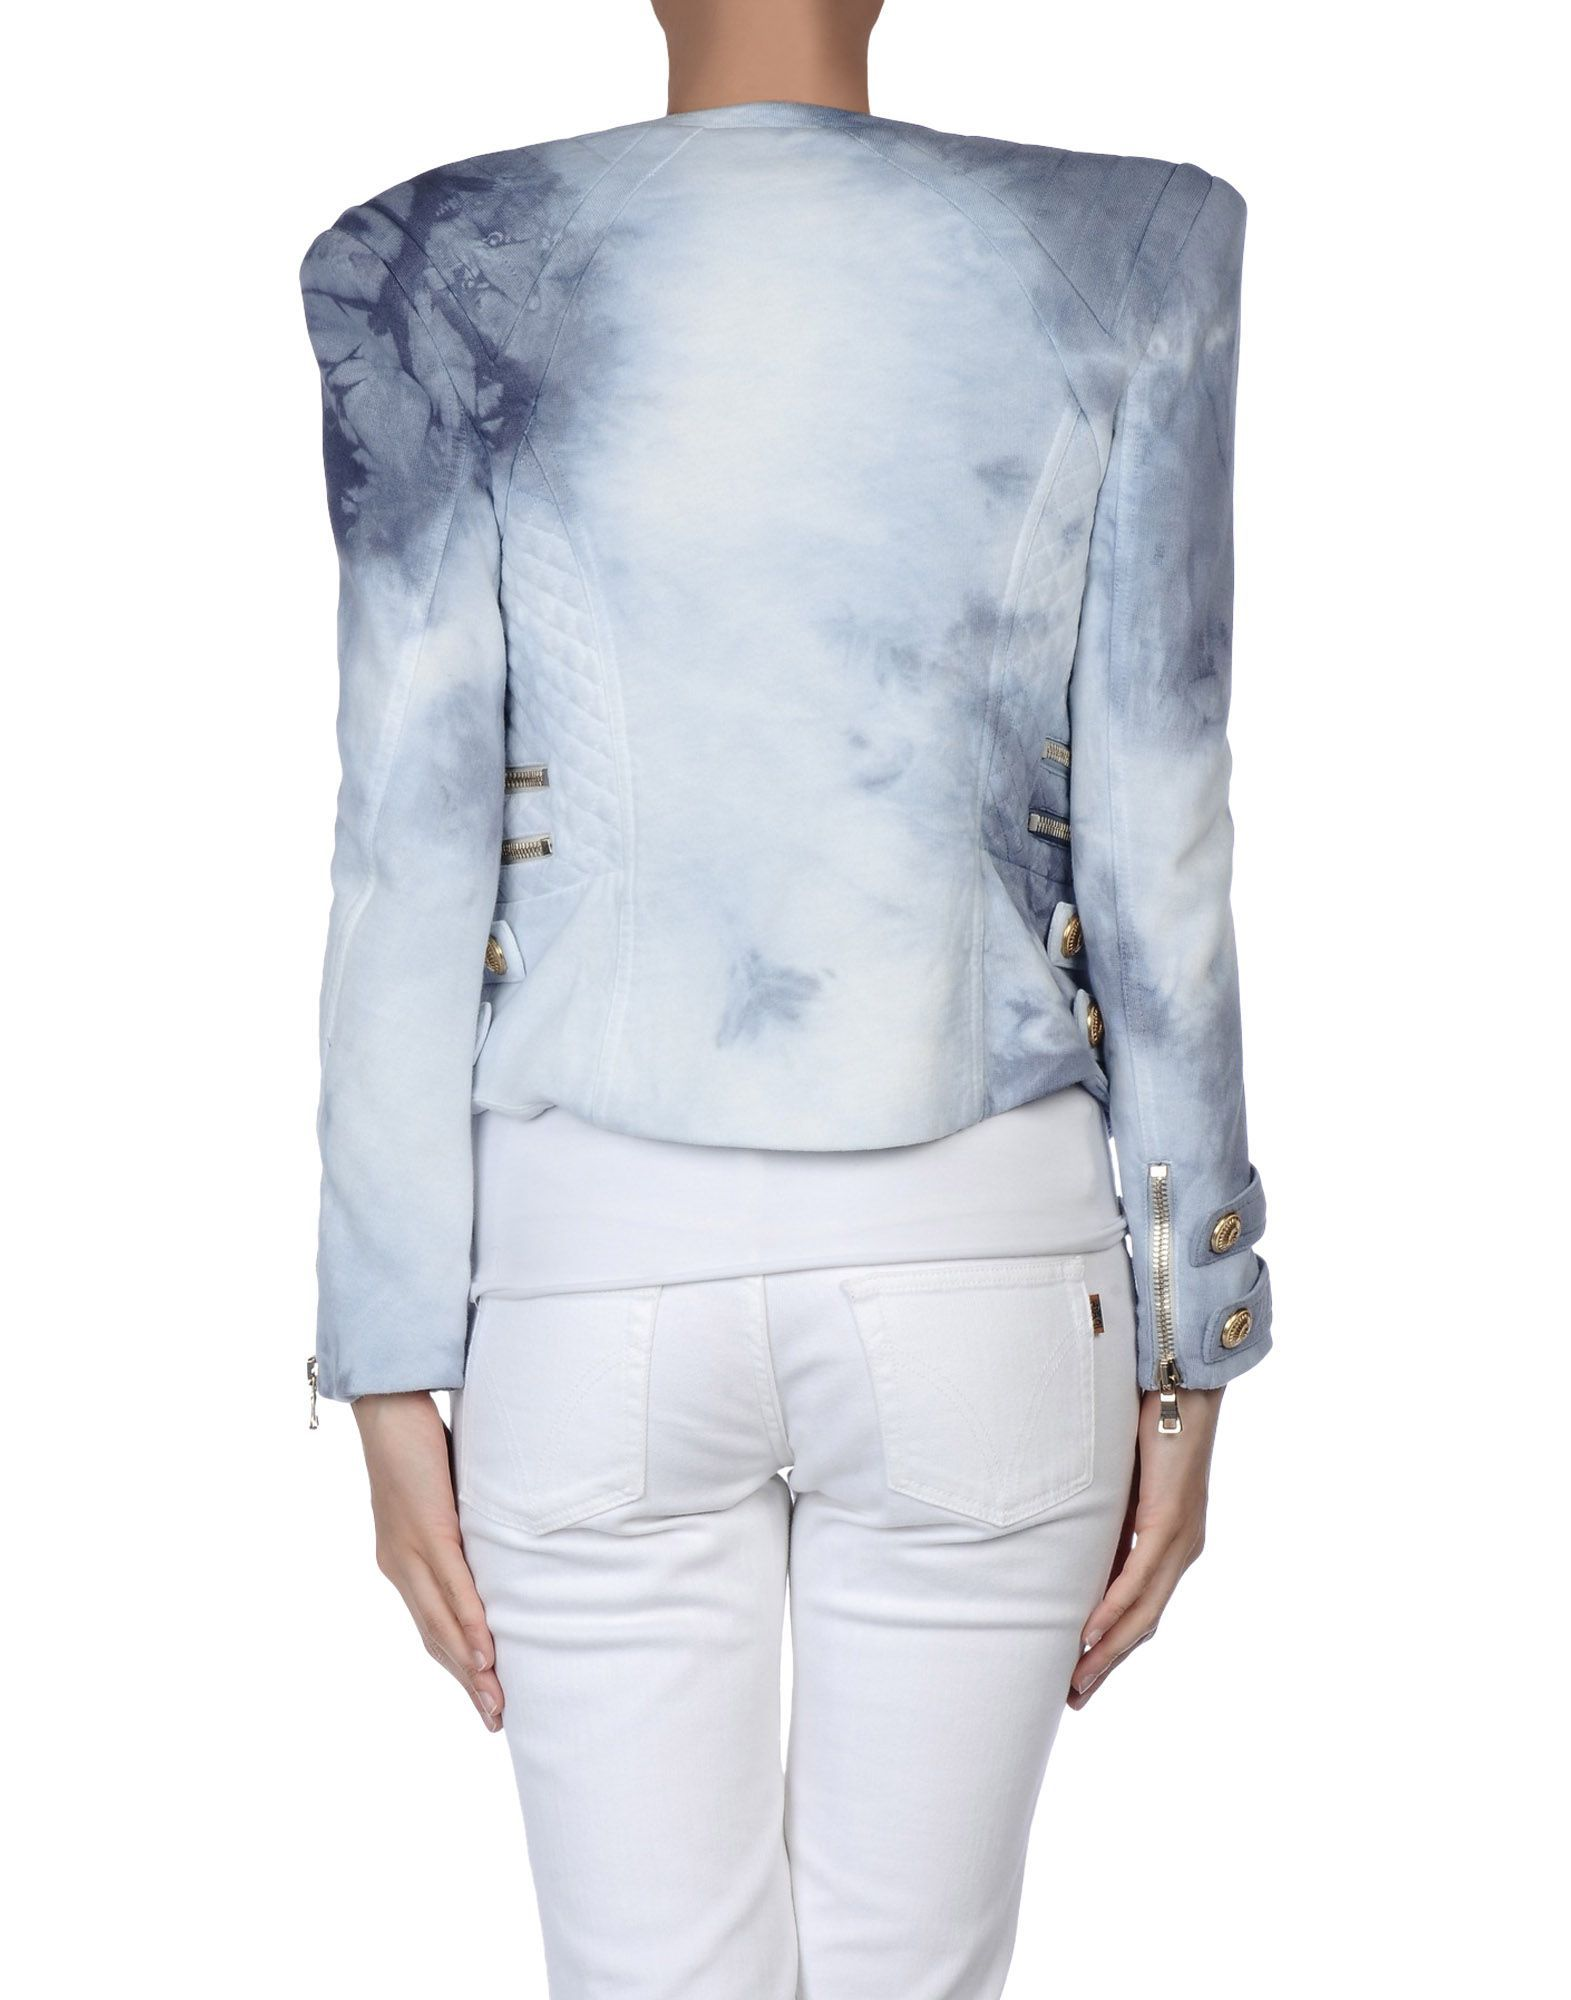 YOOX.COM Balmain 자켓 - - Balmain - 49156211HI